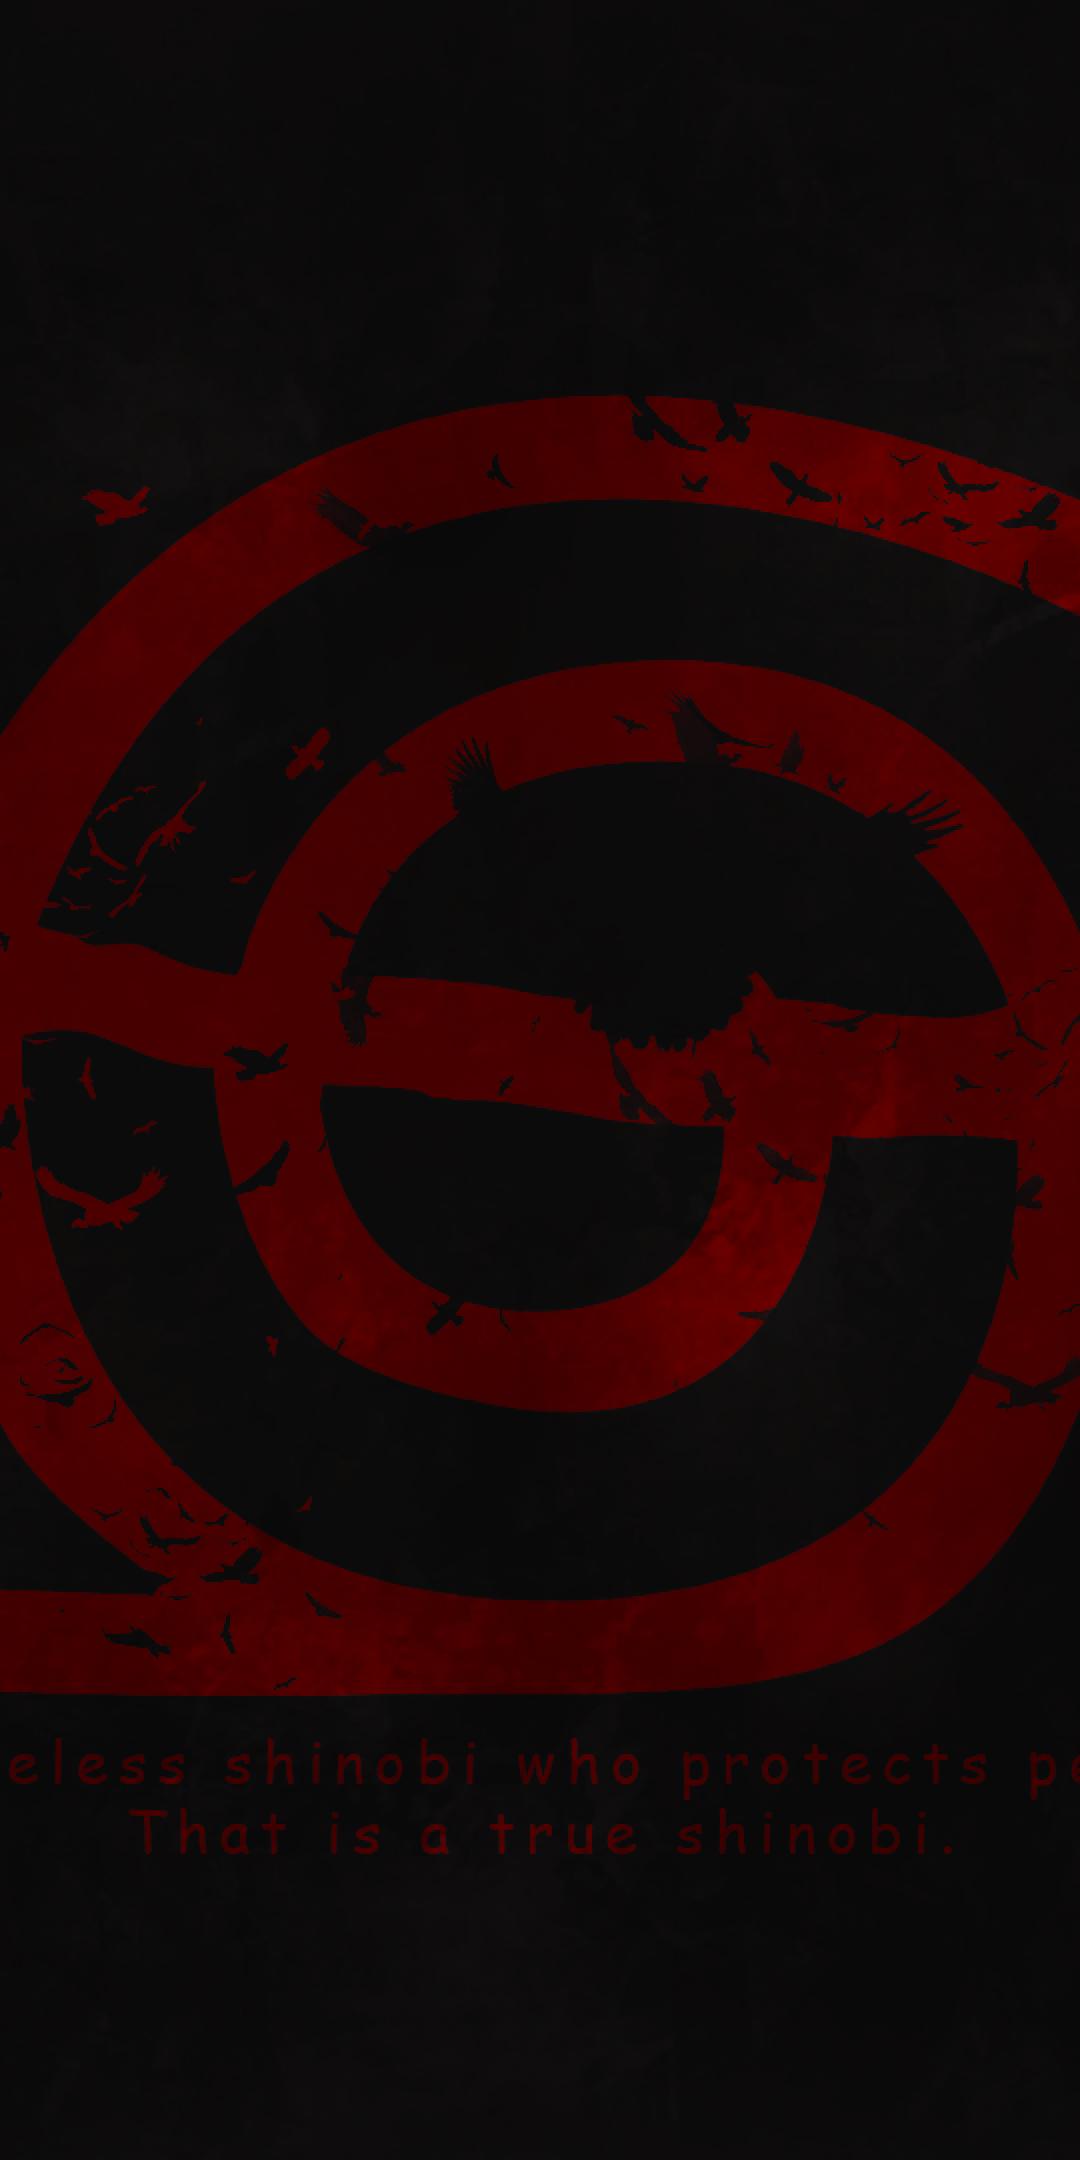 Download 1080x2160 Naruto Konoha Logo Wallpapers for Huawei